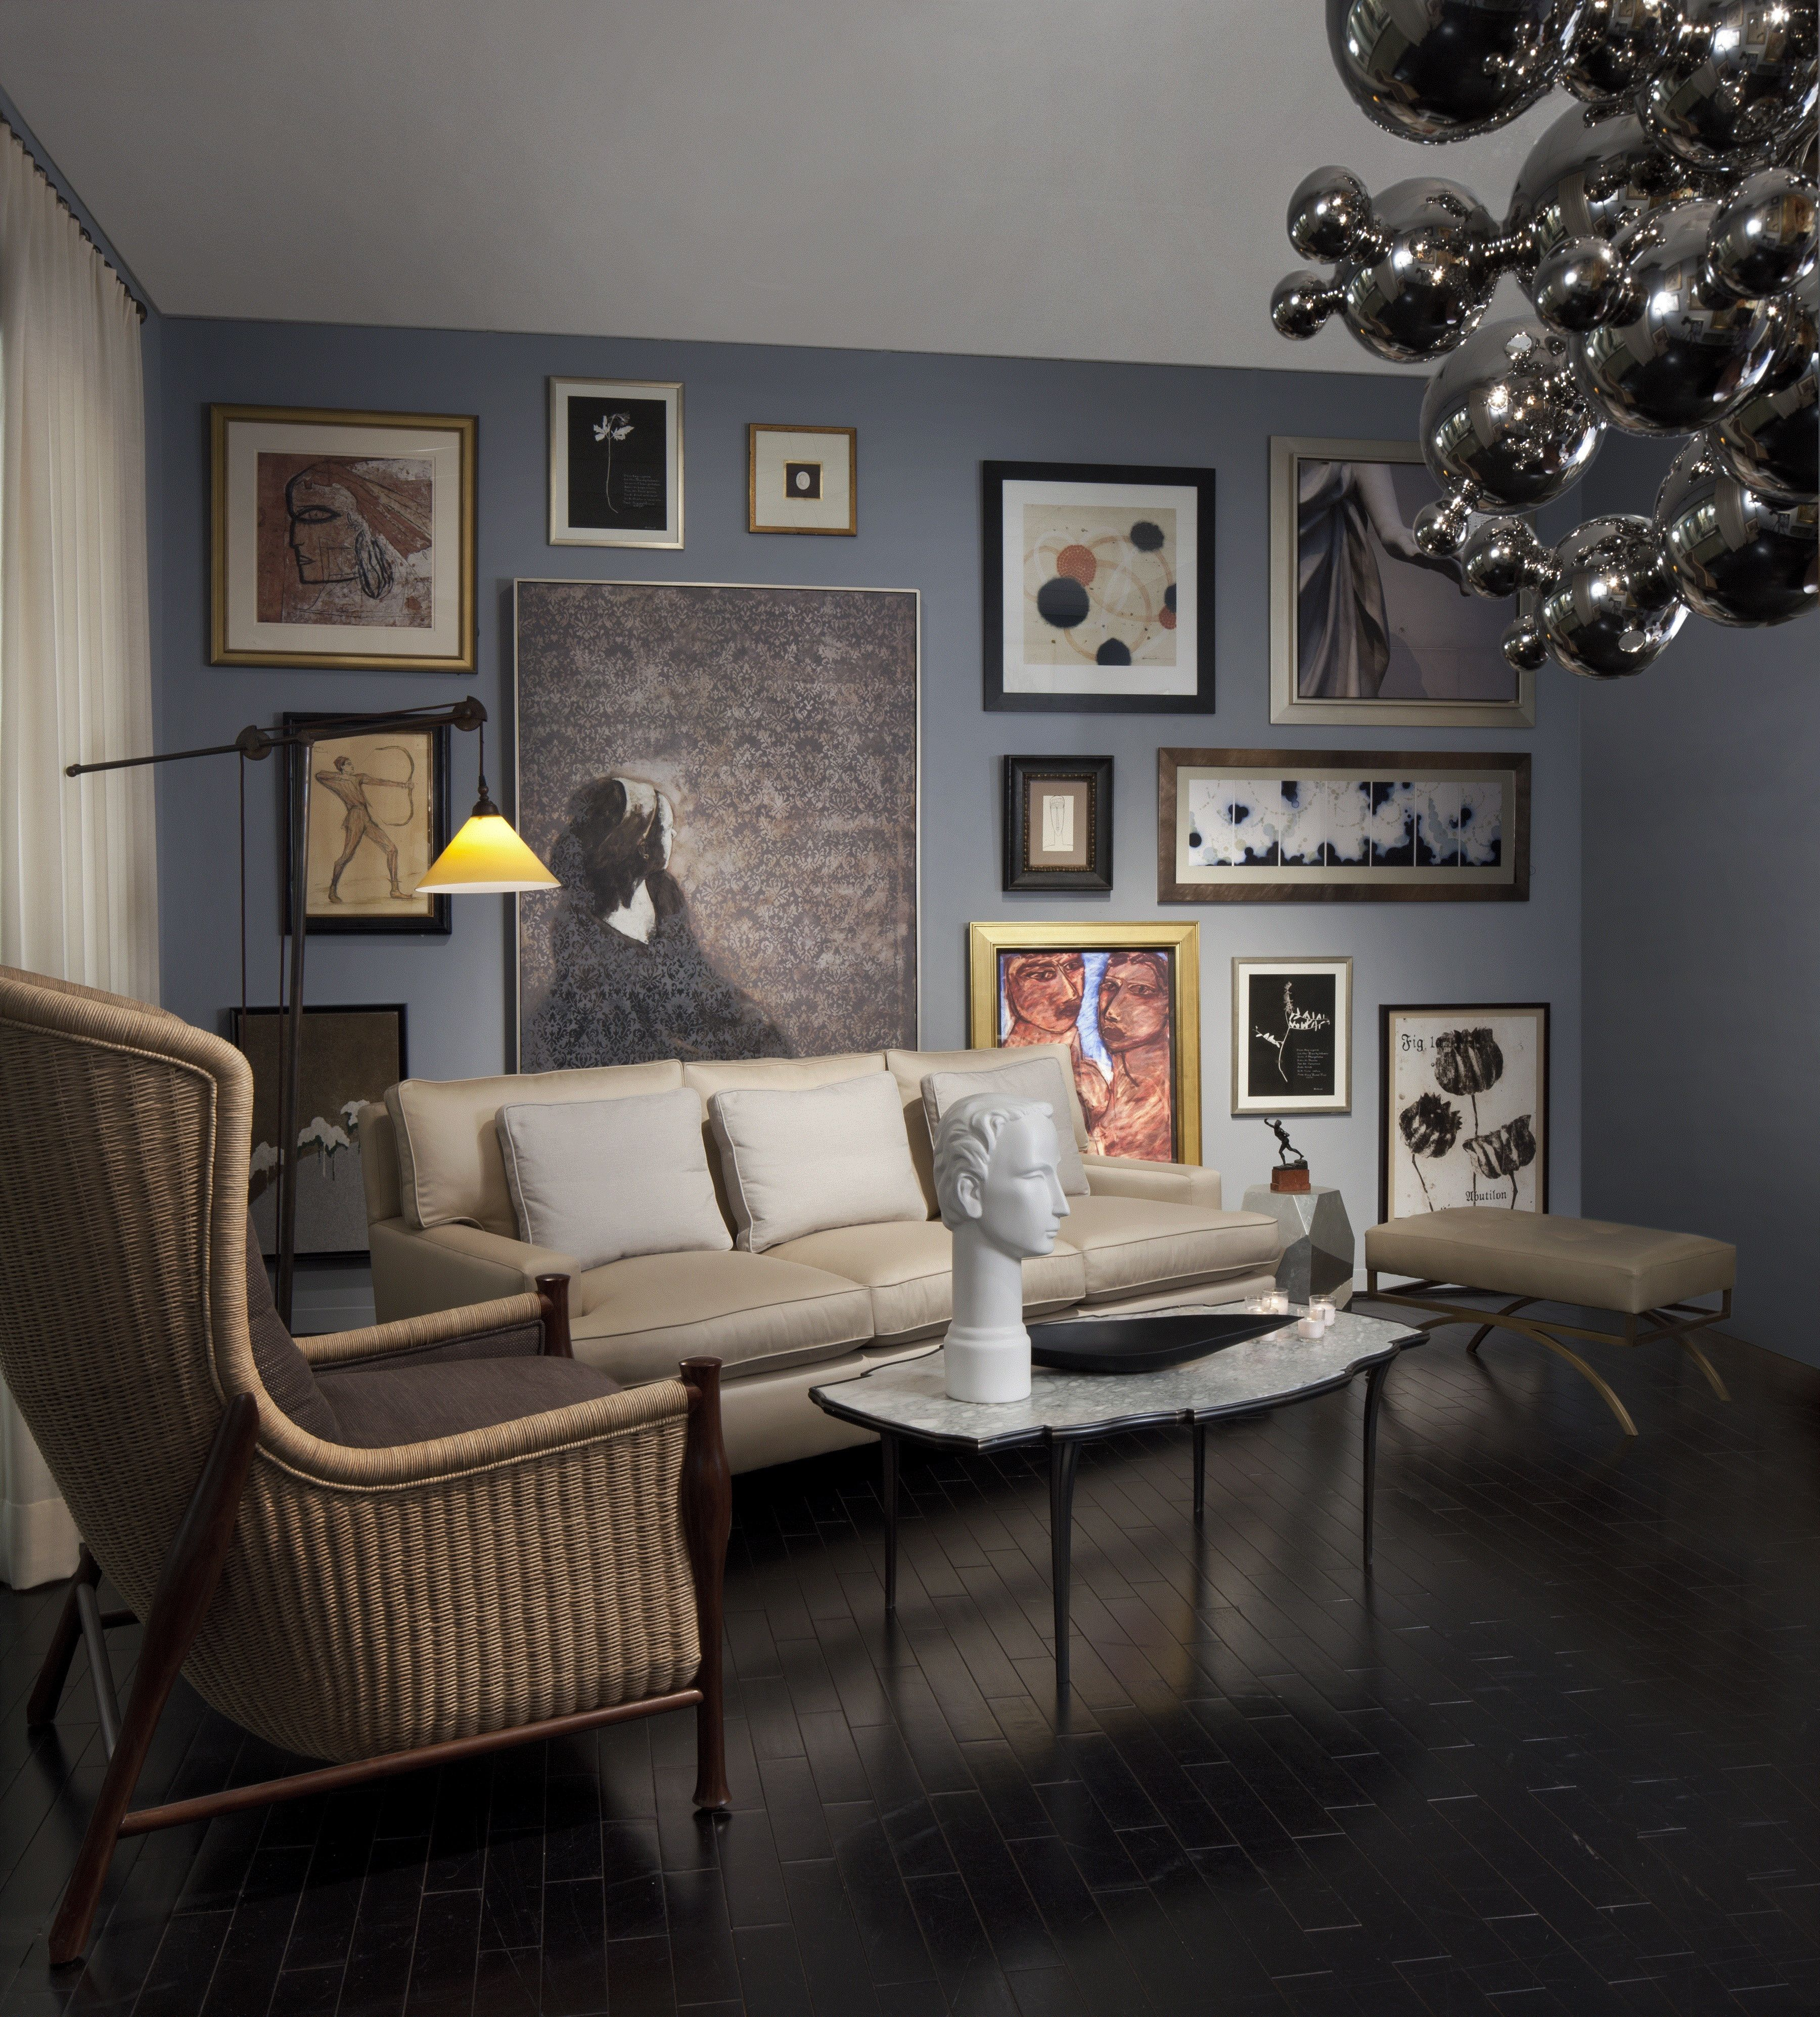 """An Art Critic's Loft"" in Baker Knapp & Tubbs, Suite 60 by Paul Feiten of Paul Feiten Design Photo by Beth Singer Paul Feiten Design"